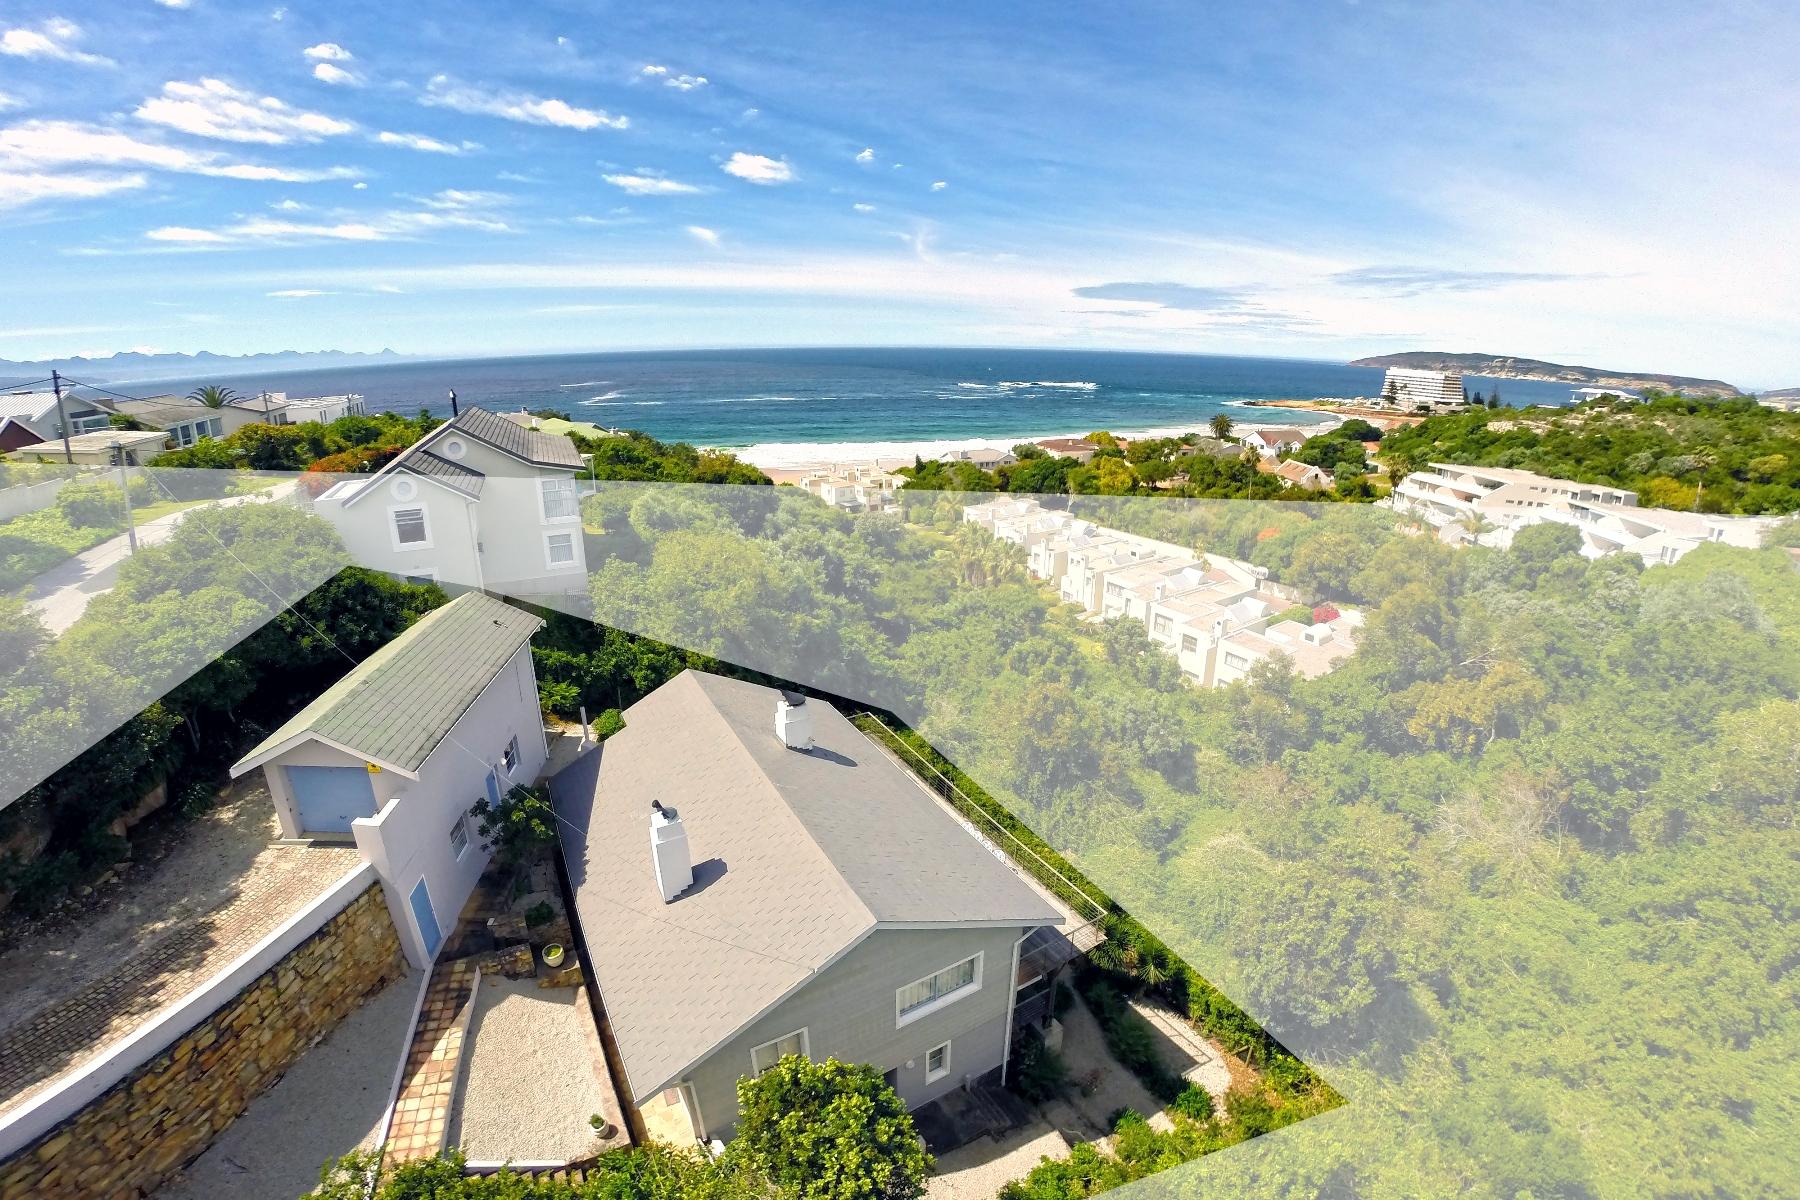 Moradia para Venda às Old Plett with Excellent Sea Views Plettenberg Bay, Western Cape, 6600 África Do Sul